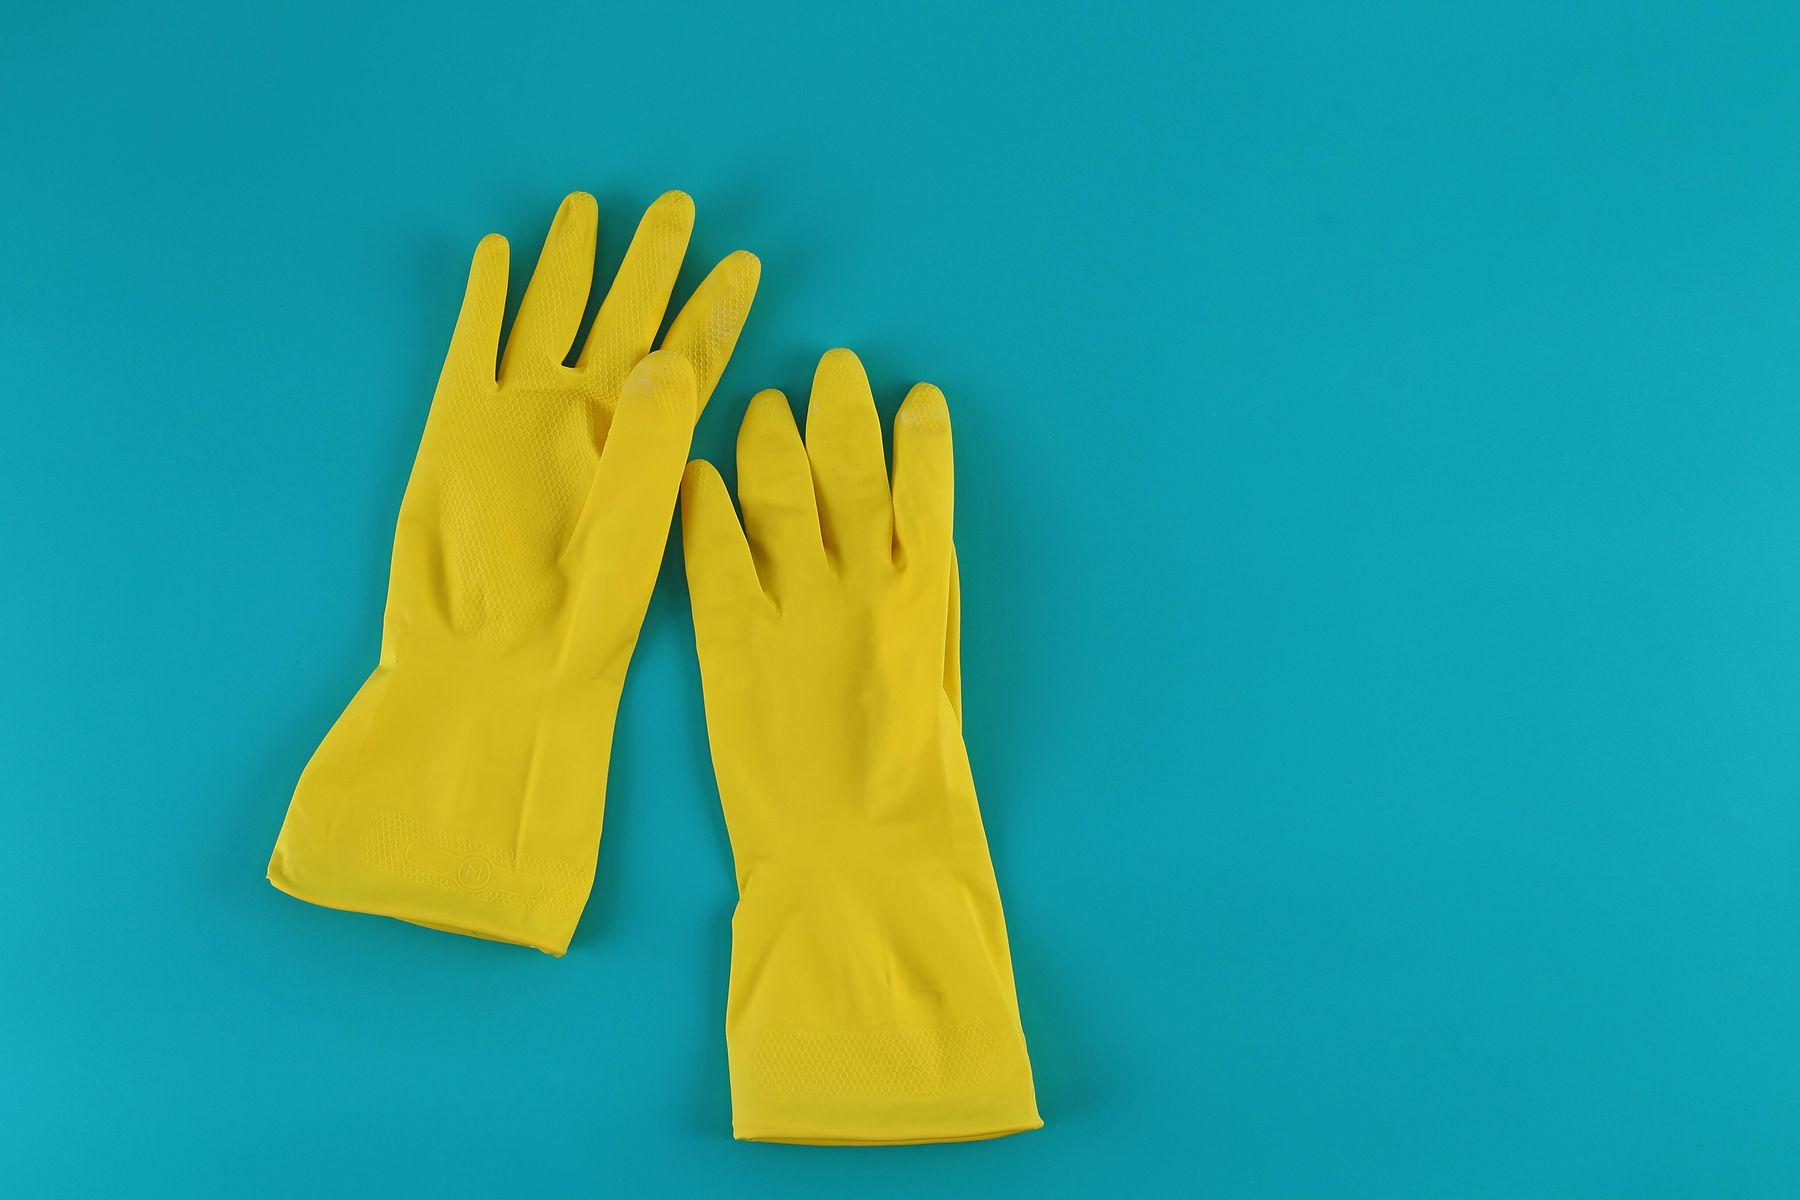 gula gummihandskar på blå bakgrund